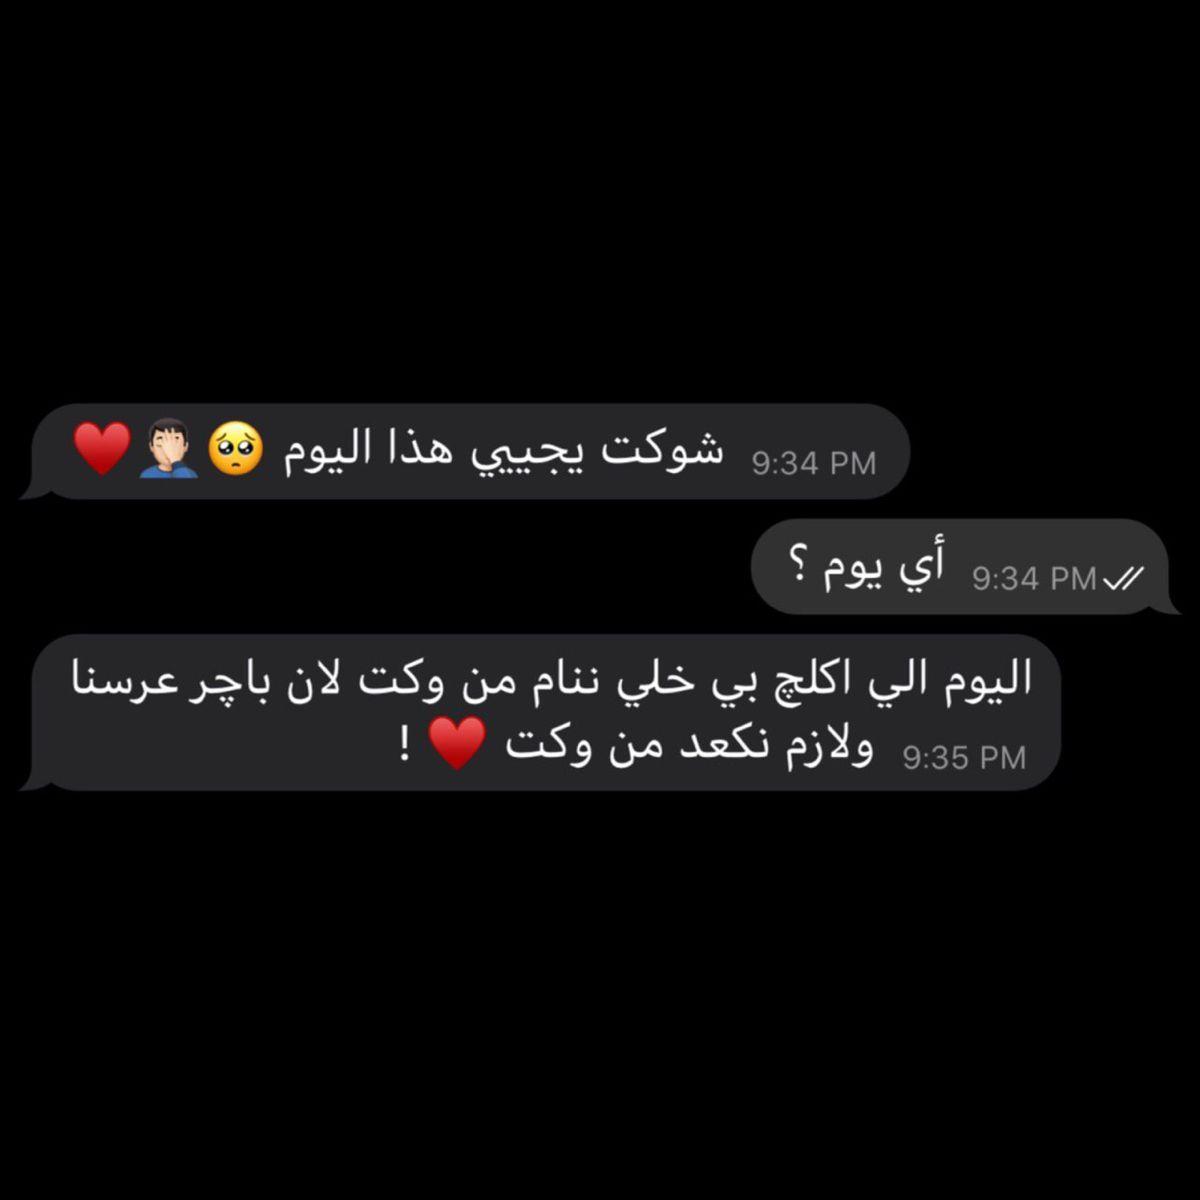 اقتباسات رمزيات كتاب كتابات تصاميم تصميم اغاني Song Lyrics Wallpaper Islamic Love Quotes Funny Arabic Quotes